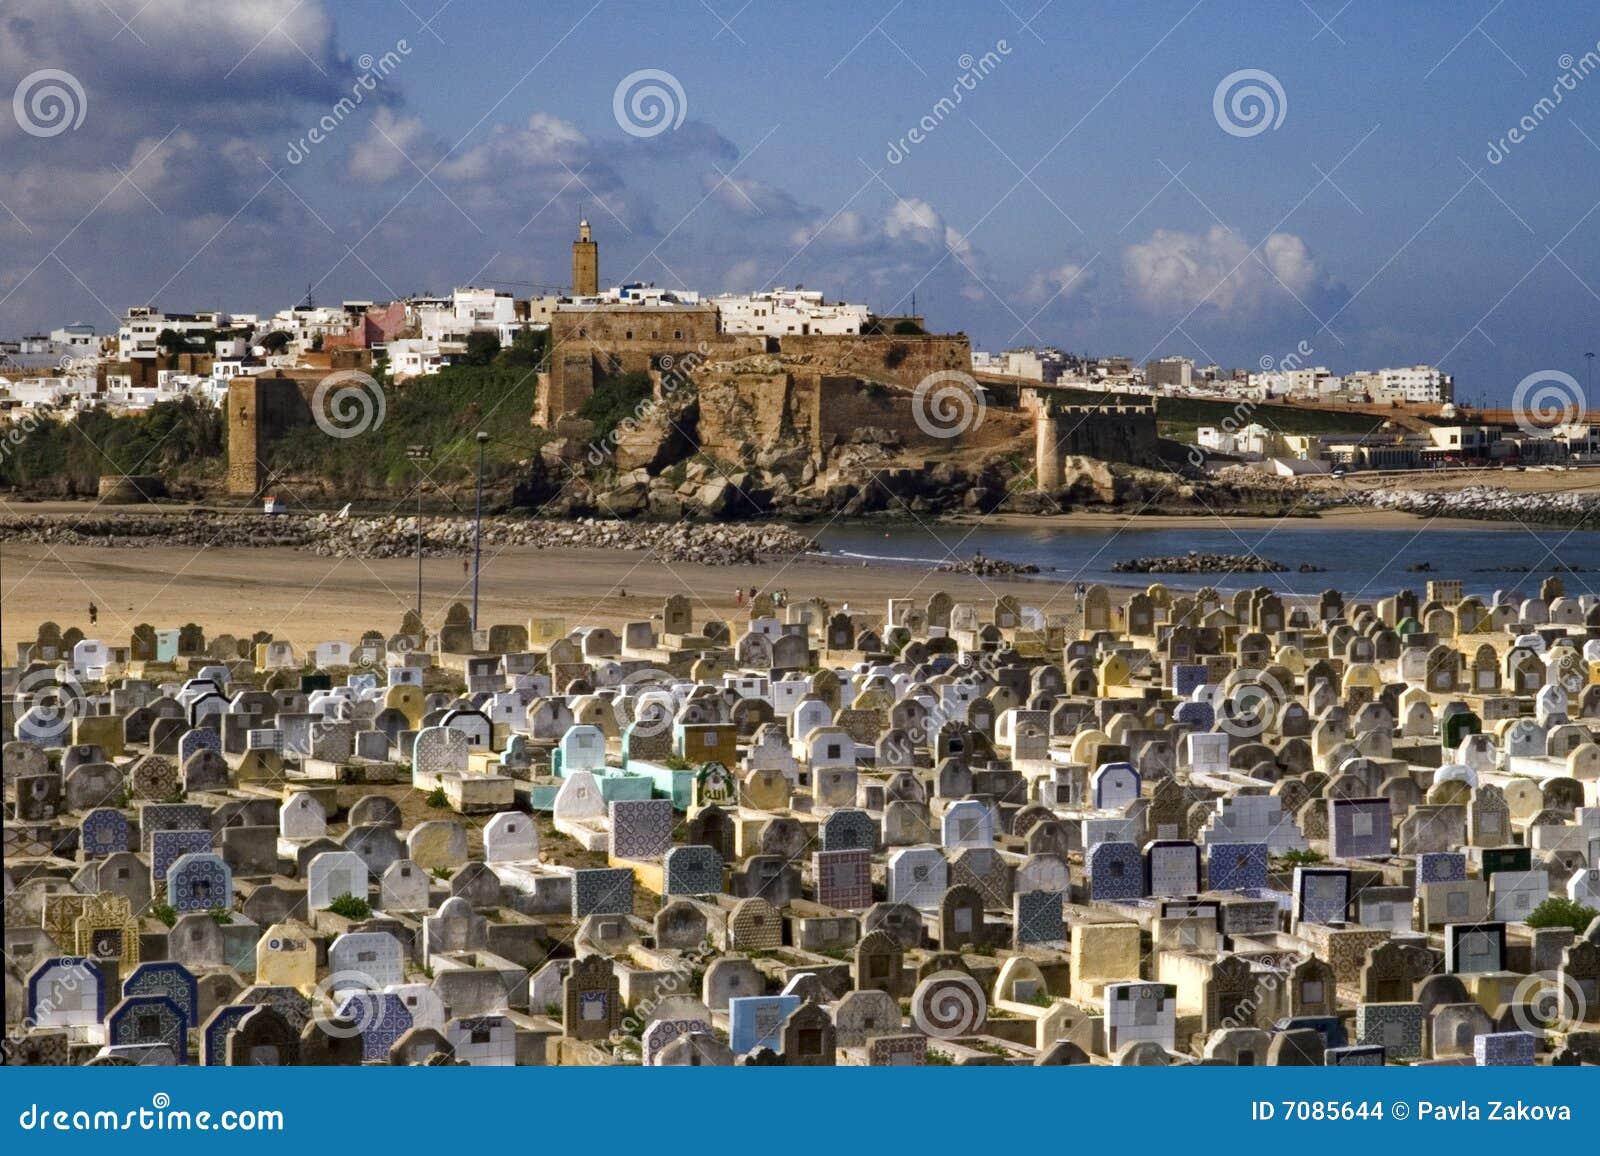 City of Rabat, Morocco